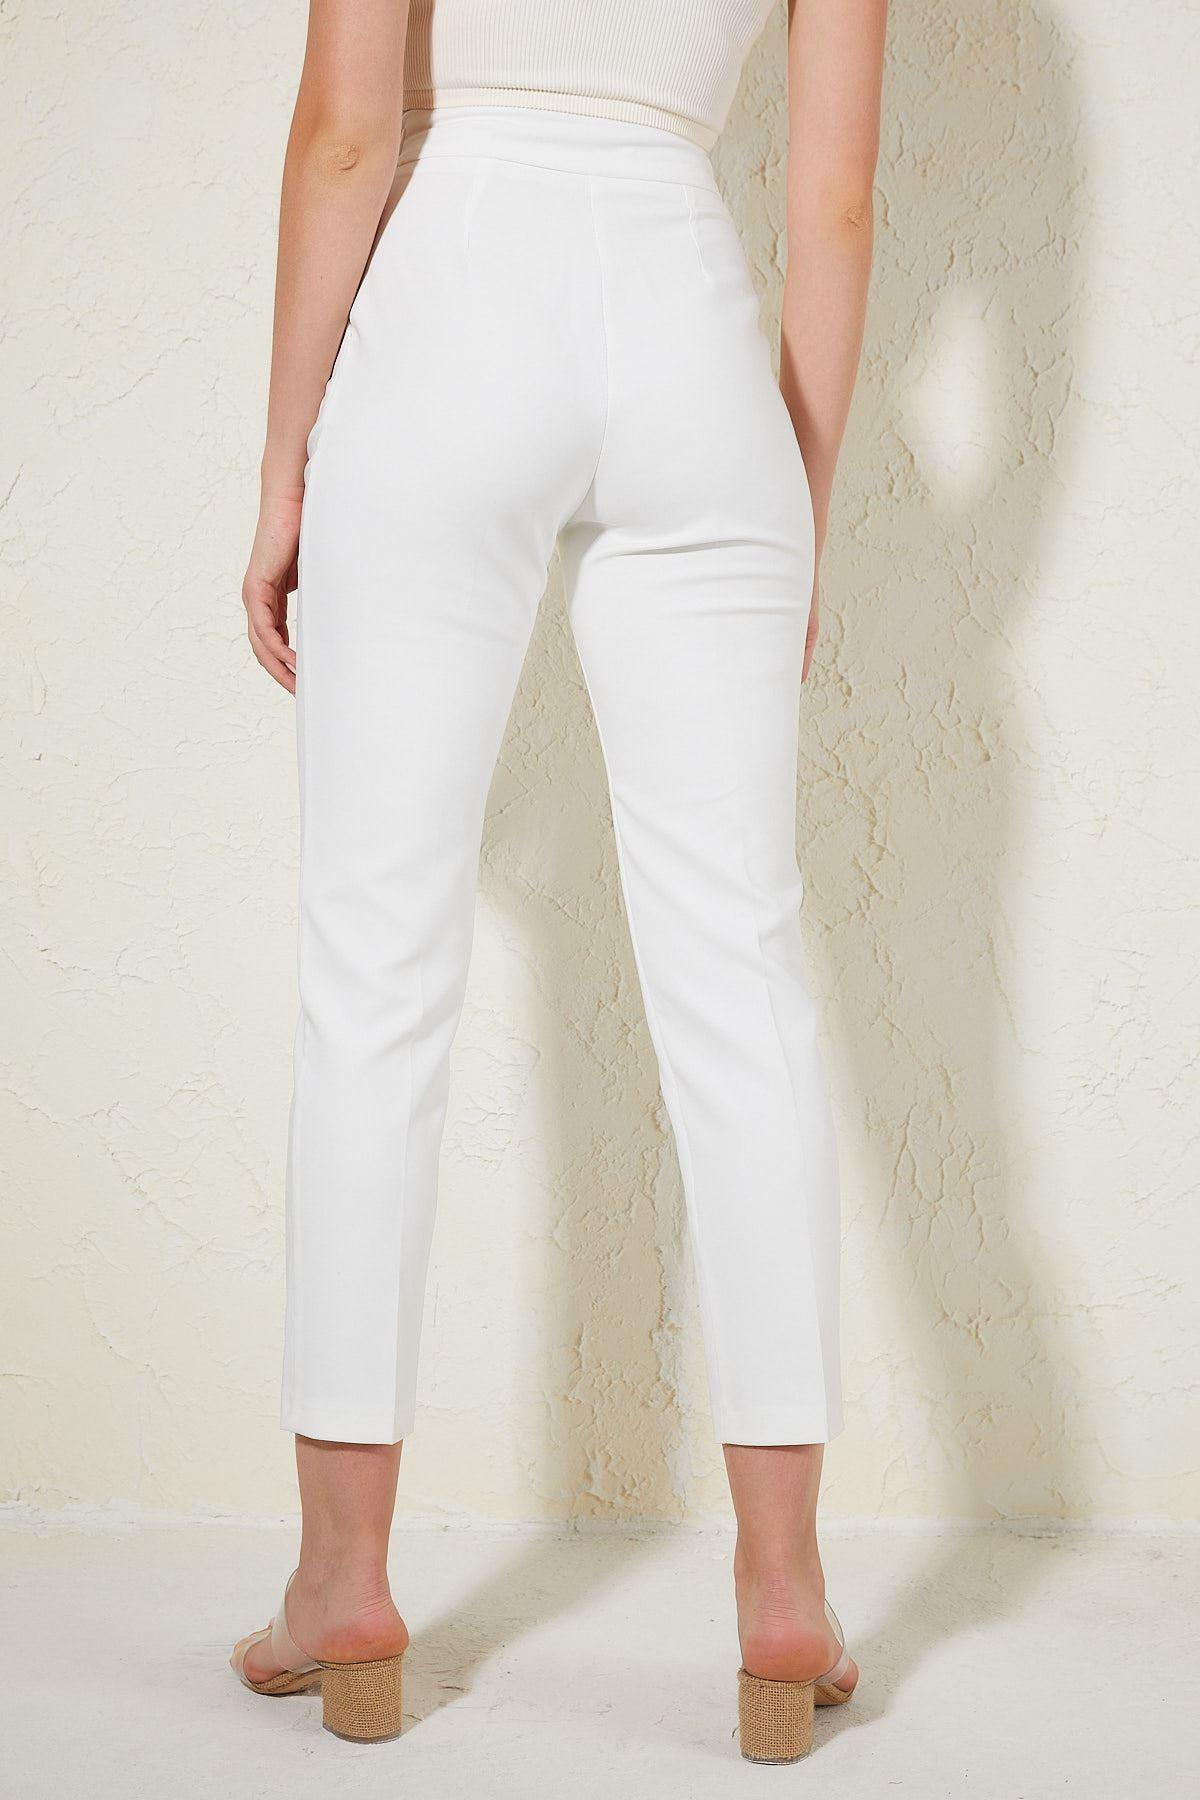 Toka Detaylı Yüksel Bel Pantolon